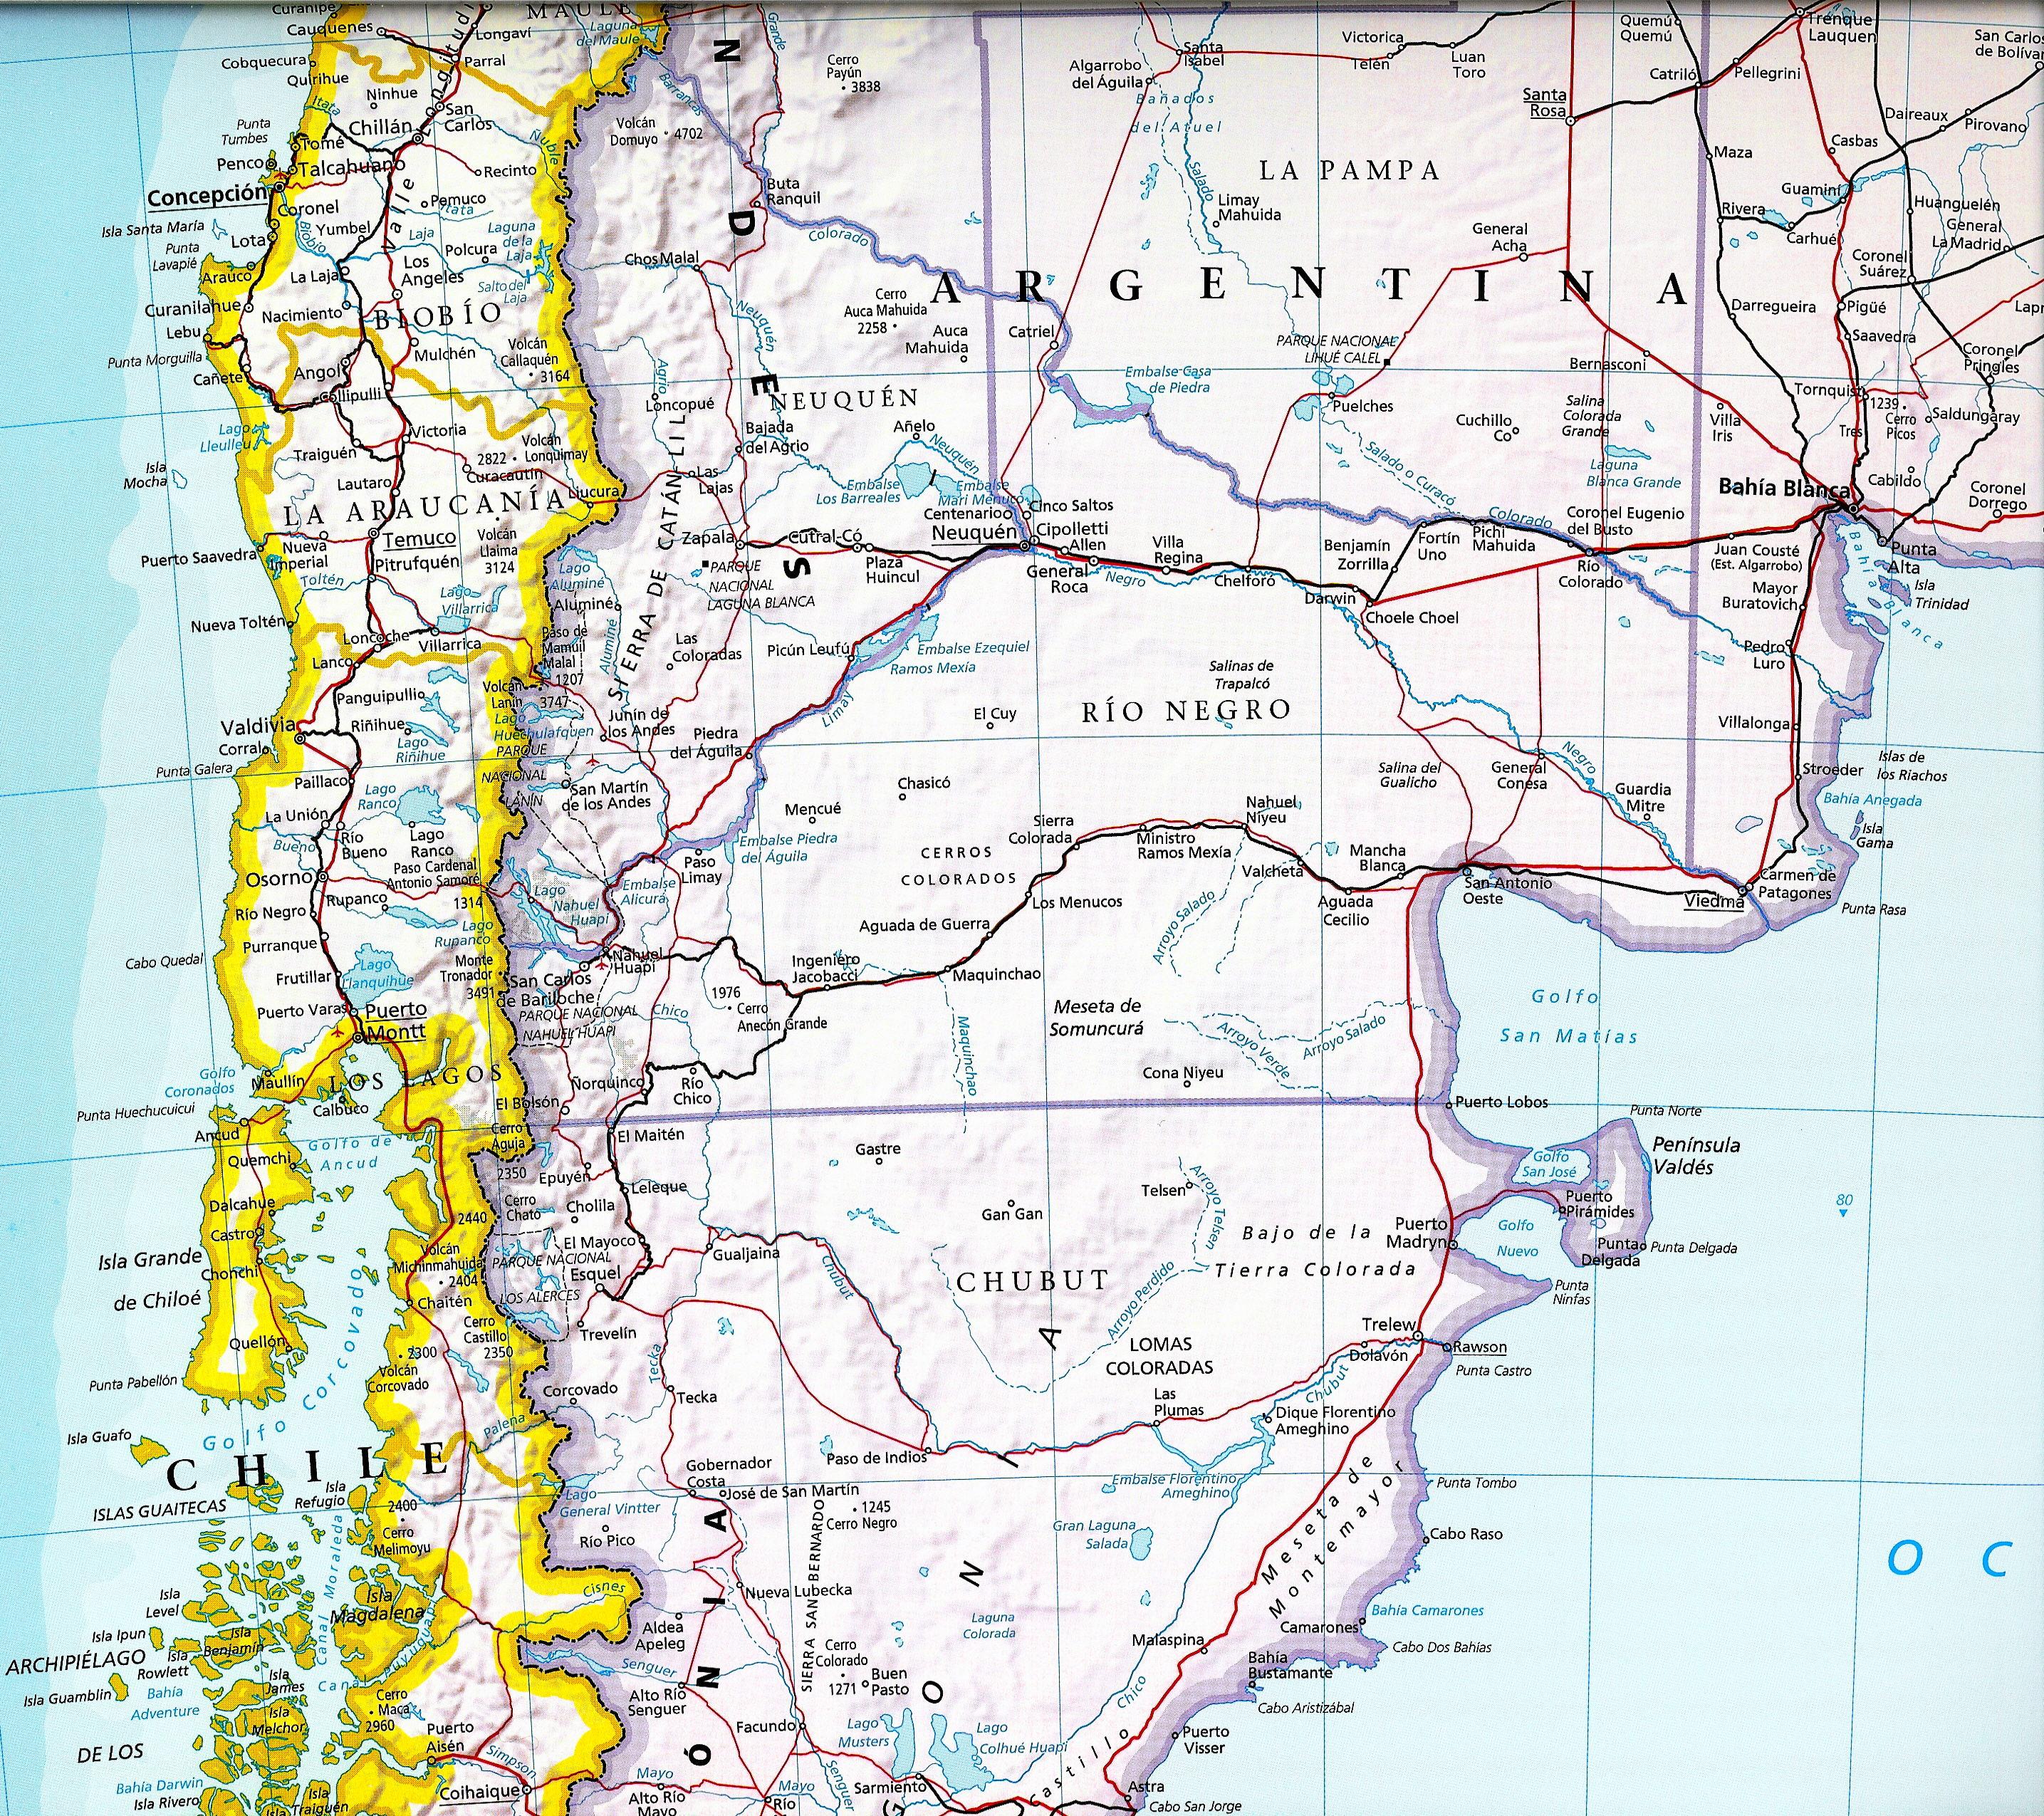 Mapa Am rica del Sur Am rica do Sul South America map Flickr Photo Sh